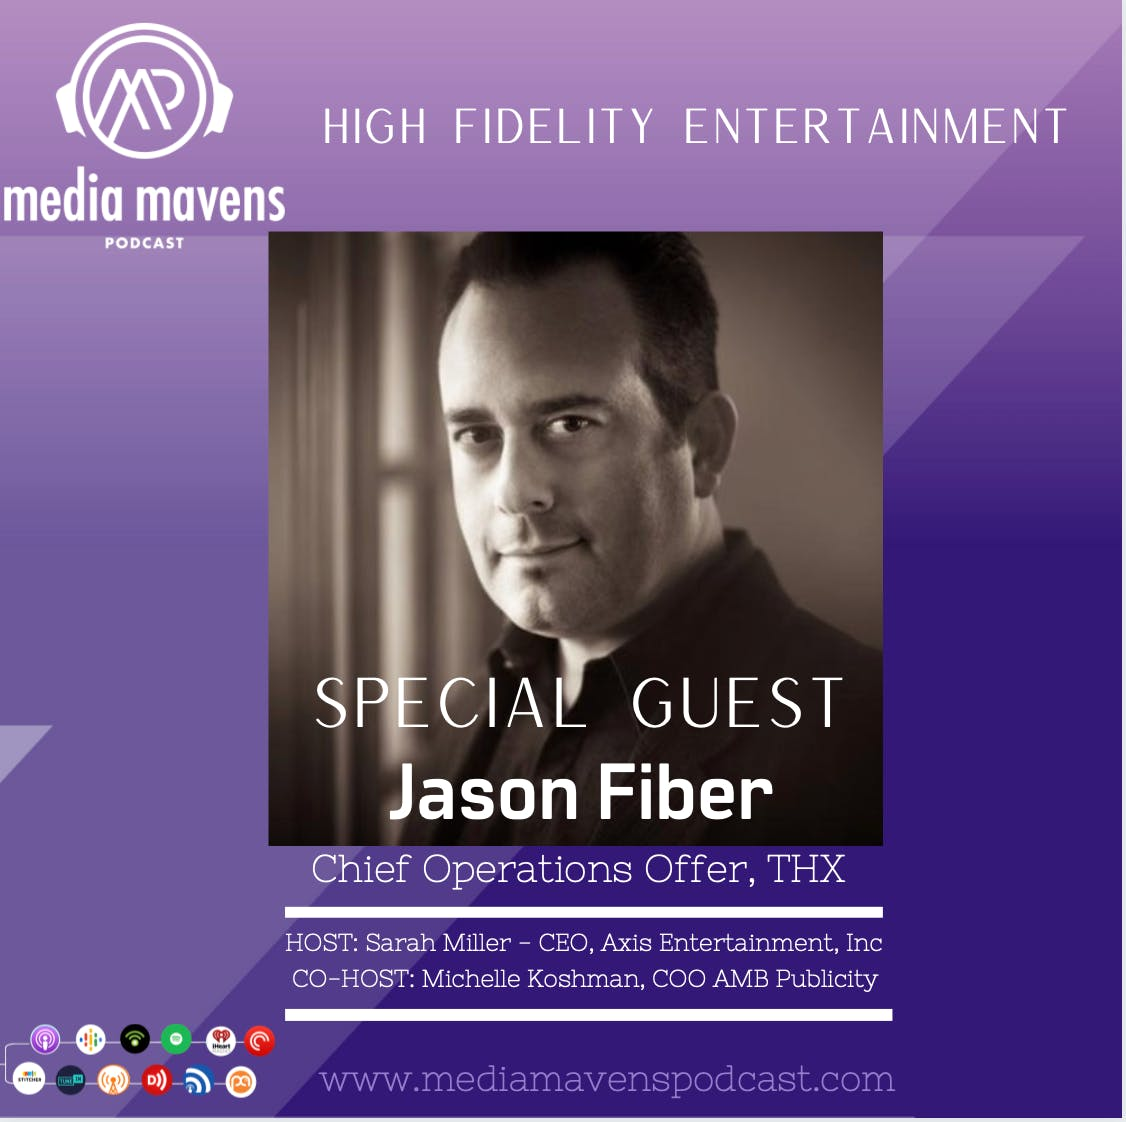 High Fidelity Entertainment